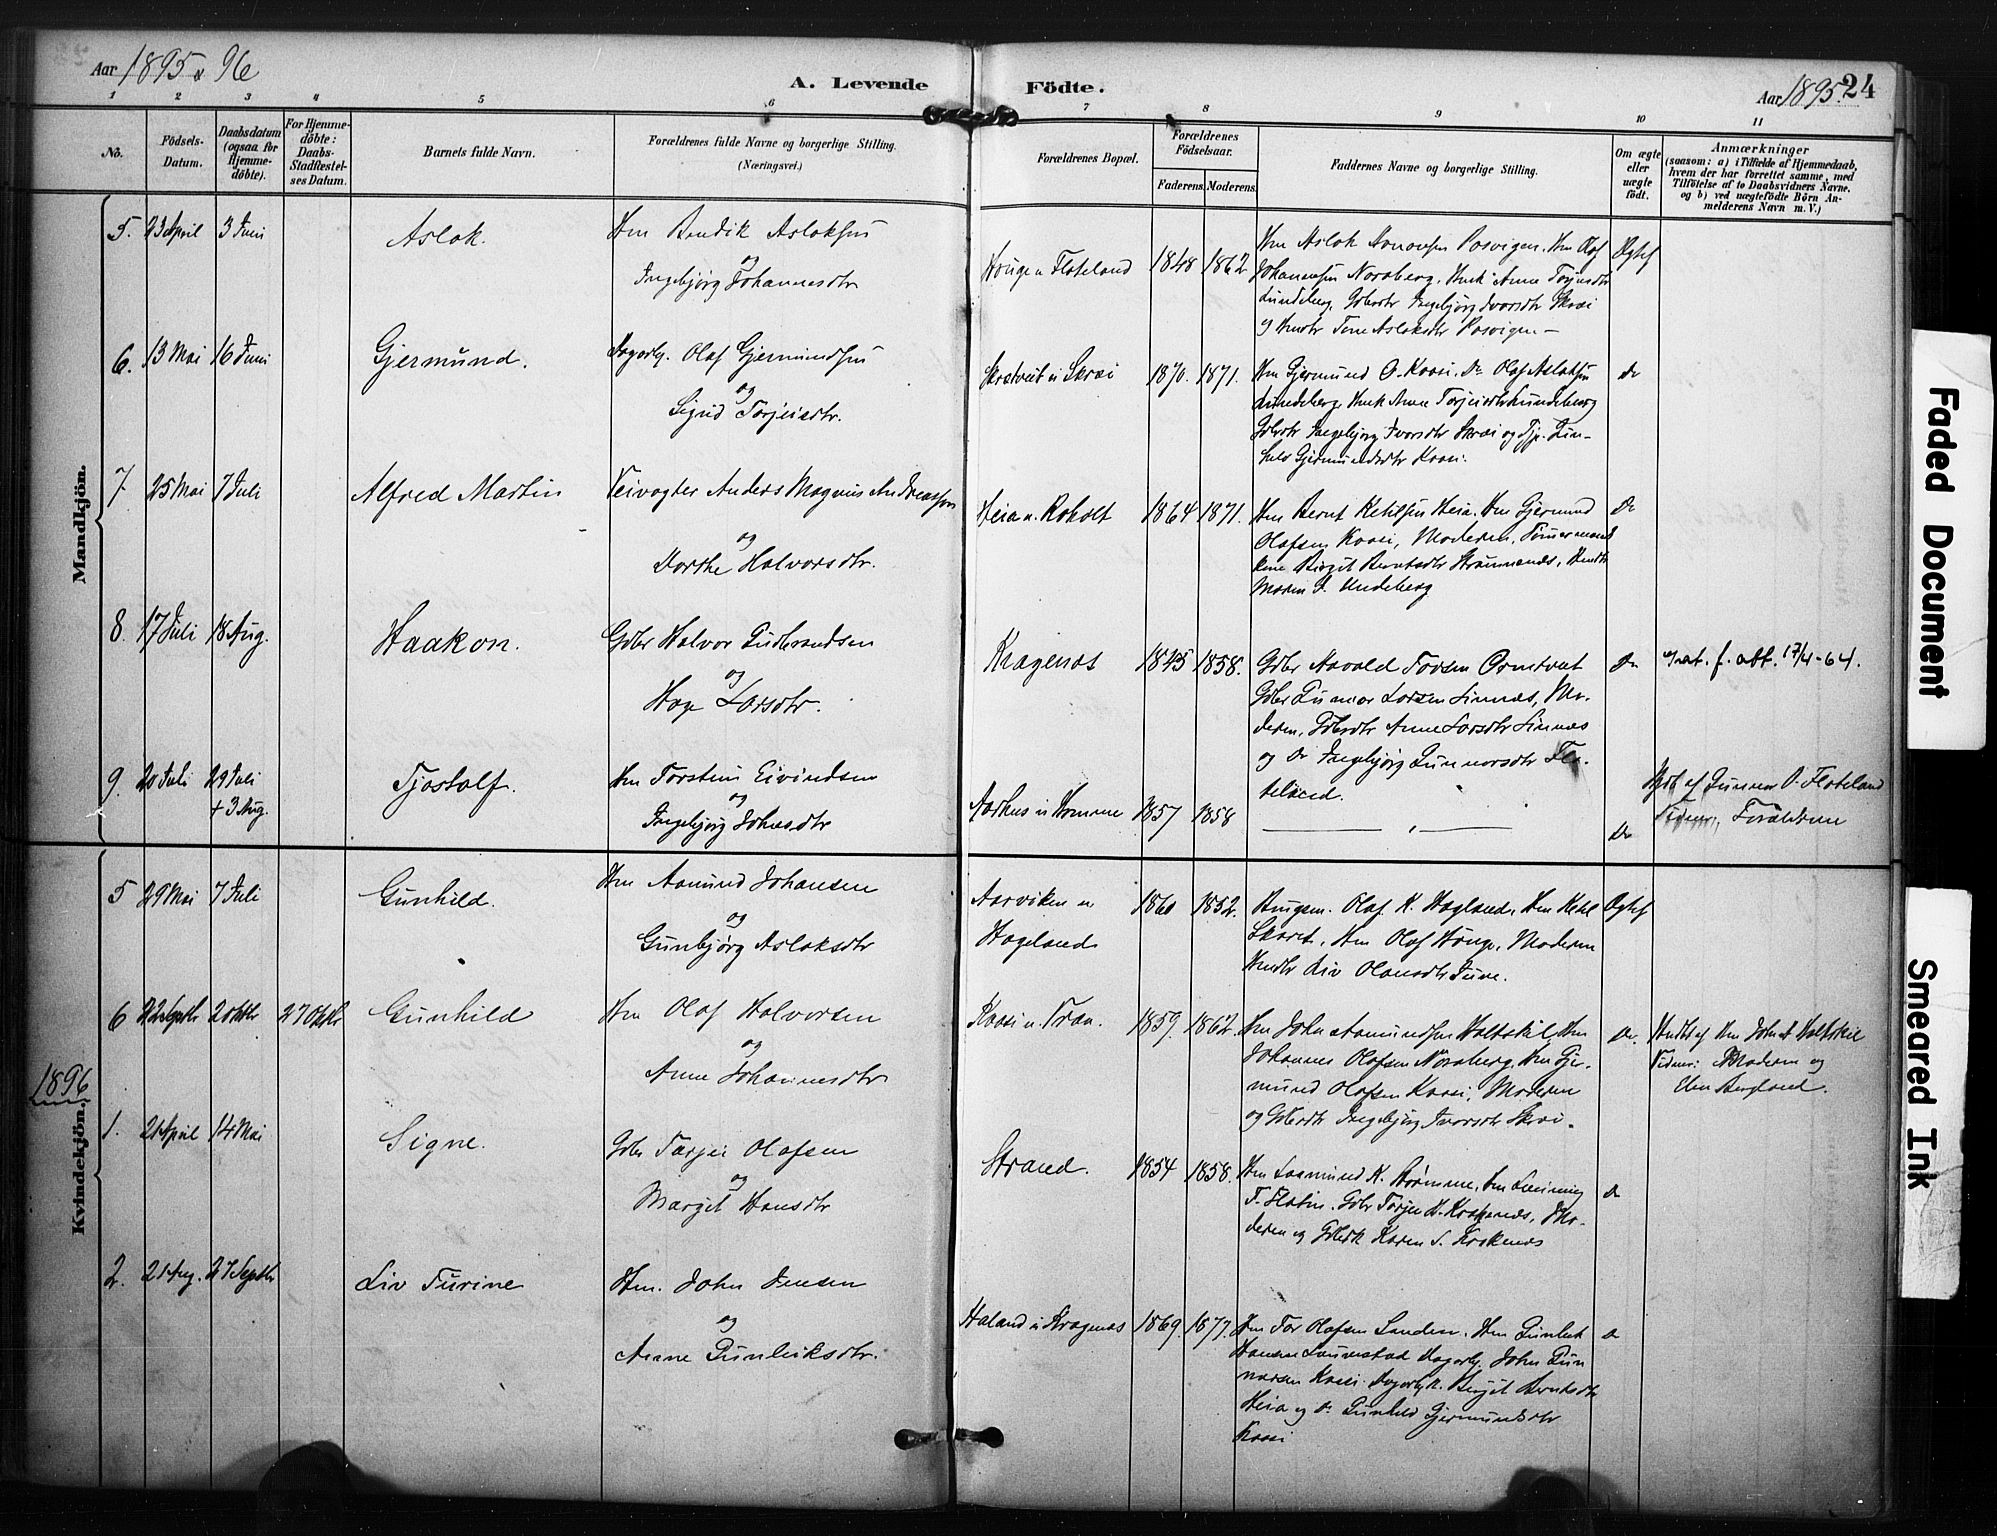 SAKO, Kviteseid kirkebøker, F/Fc/L0002: Ministerialbok nr. III 2, 1882-1908, s. 24